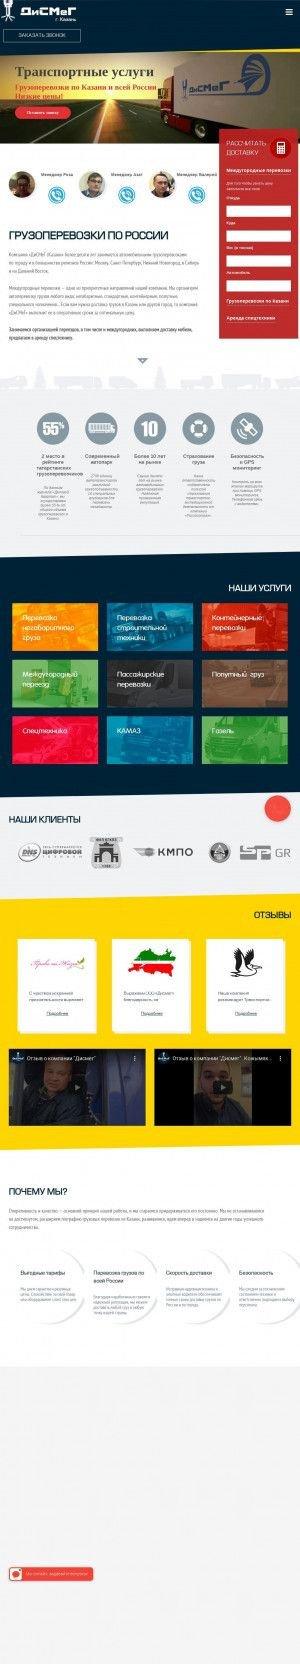 Предпросмотр для www.dismeg.ru — Дисмег регион